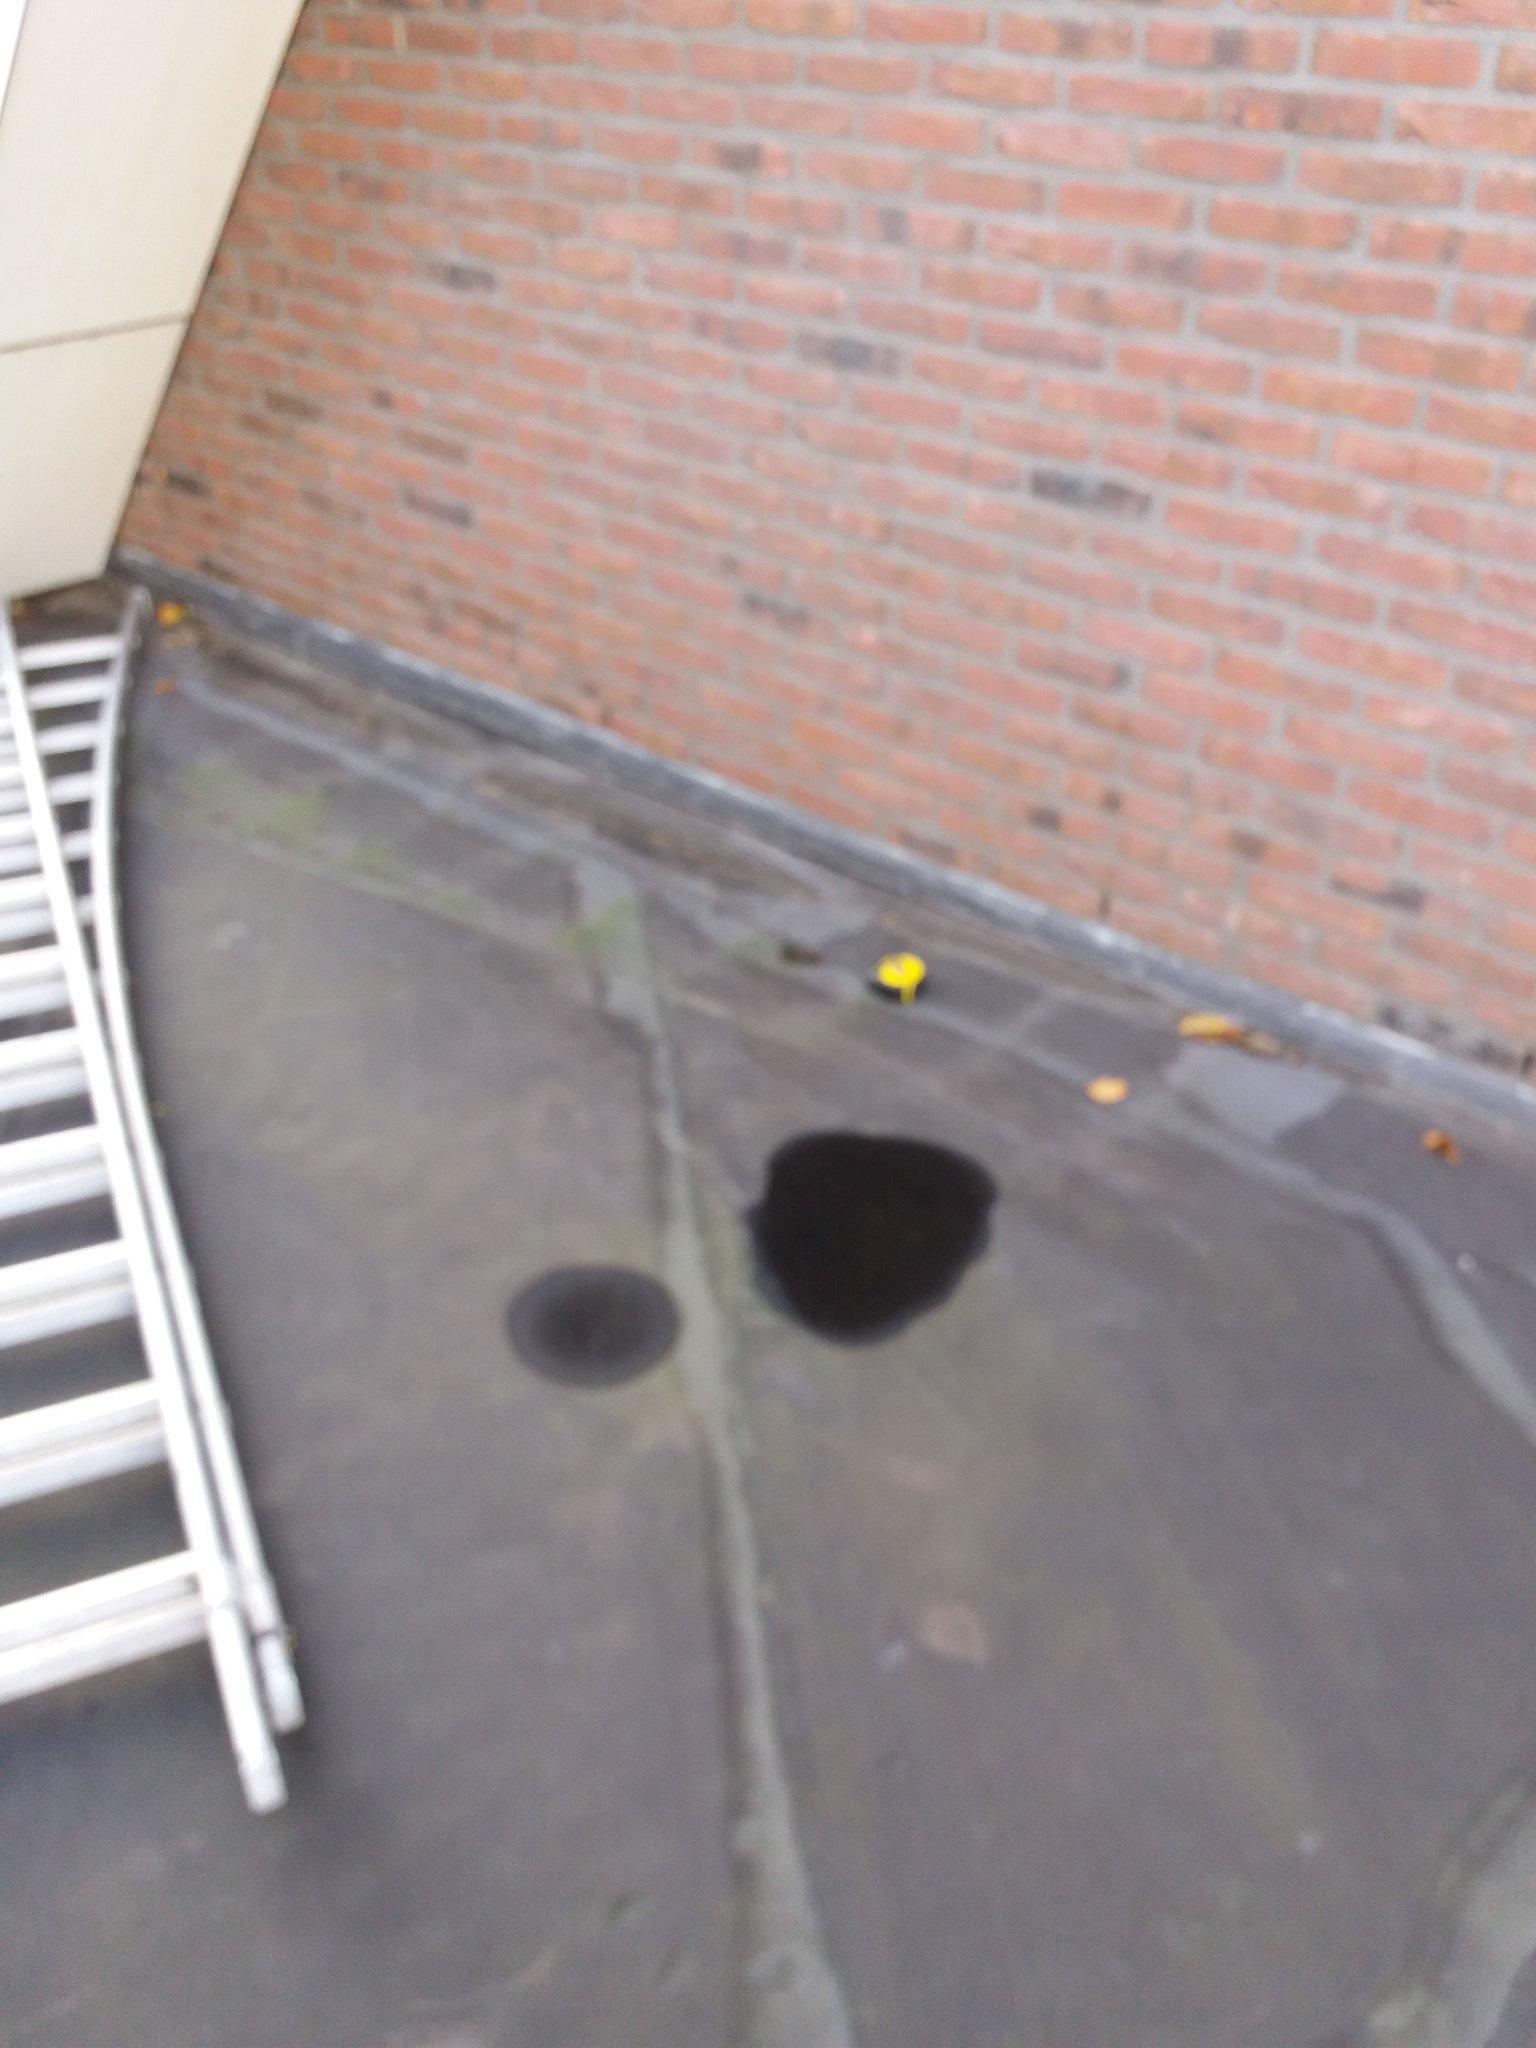 Bekend Gat boren in plat dak beton met bitumen - Werkspot NL82